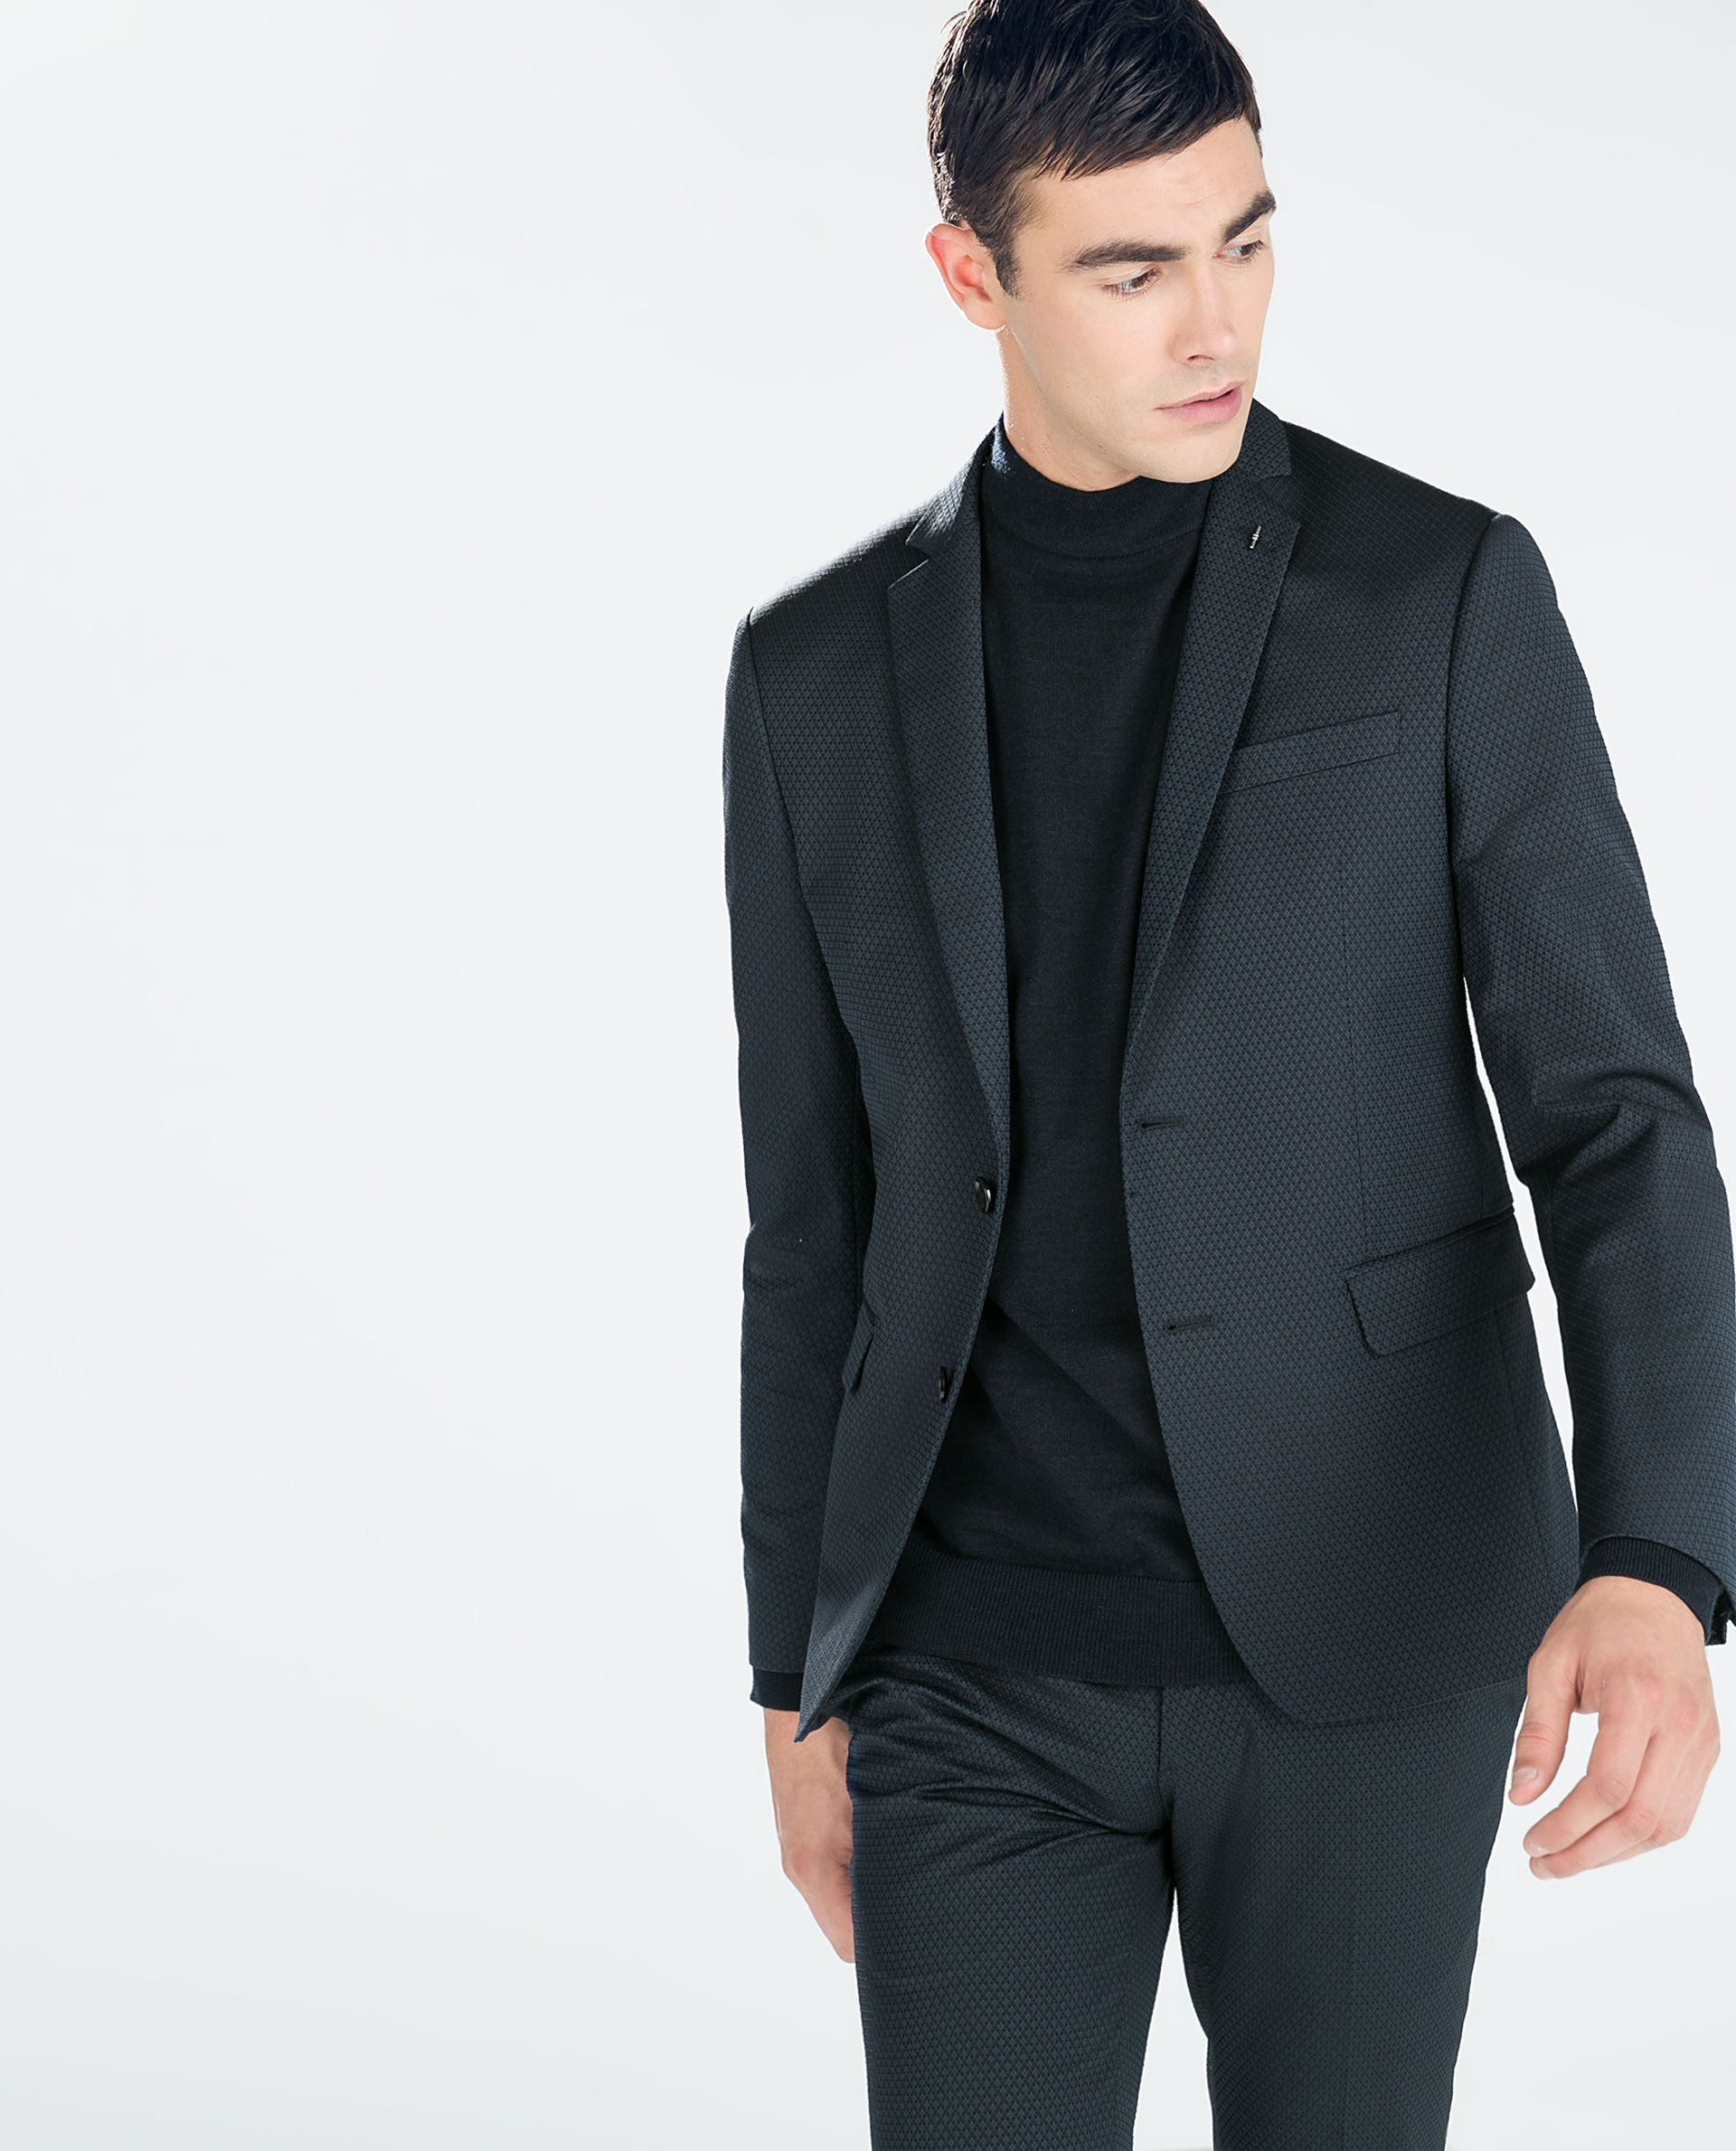 ZARA - HOMBRE - TRAJE JACQUARD AZUL tejido con textura chaqueta 80€ pantalon  40€ 2d64a76e0b6